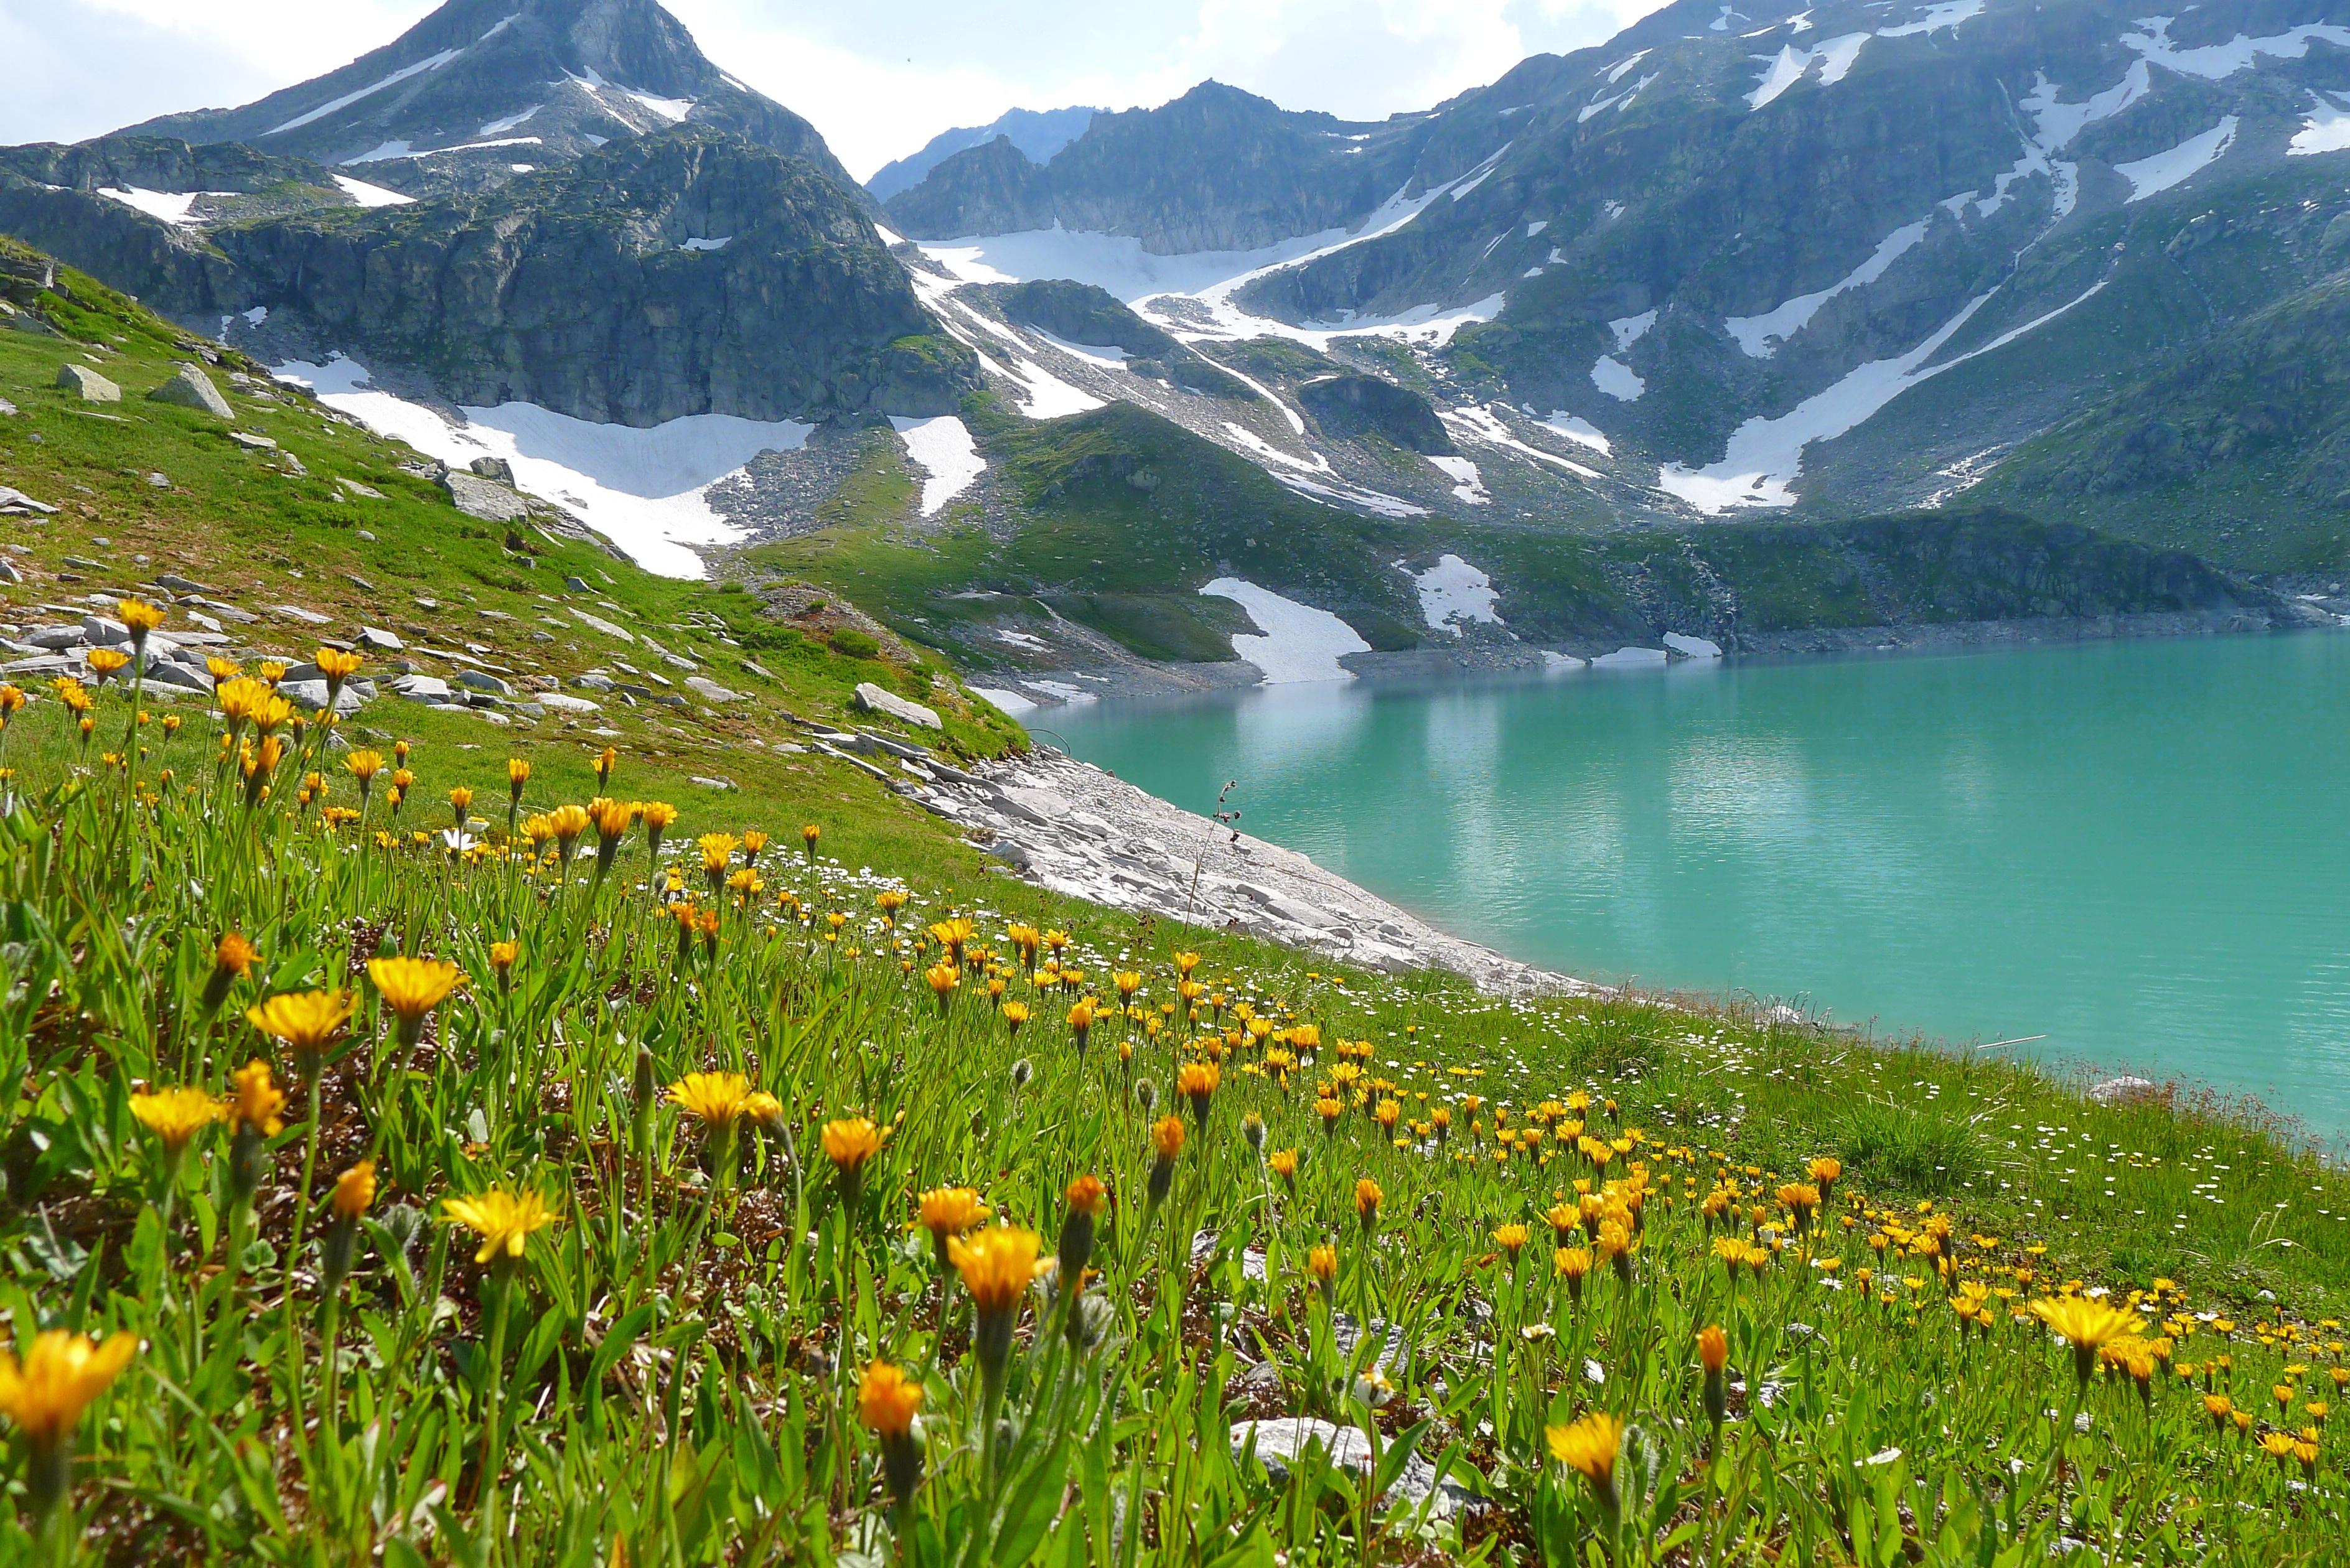 landscape-wilderness-mountain-meadow-prairie-flower-lake-valley-mountain-range-pasture-fjord-ridge-plain-wildflower-alps-grassland-plateau-bergsee-fell-loch-ecosystem-flower-meadow-tundra-landform-tarn-mountain-pass-alpine-landscape-wei-see-salzburg-austria-geographical-feature-mountainous-landforms-562413.jpg